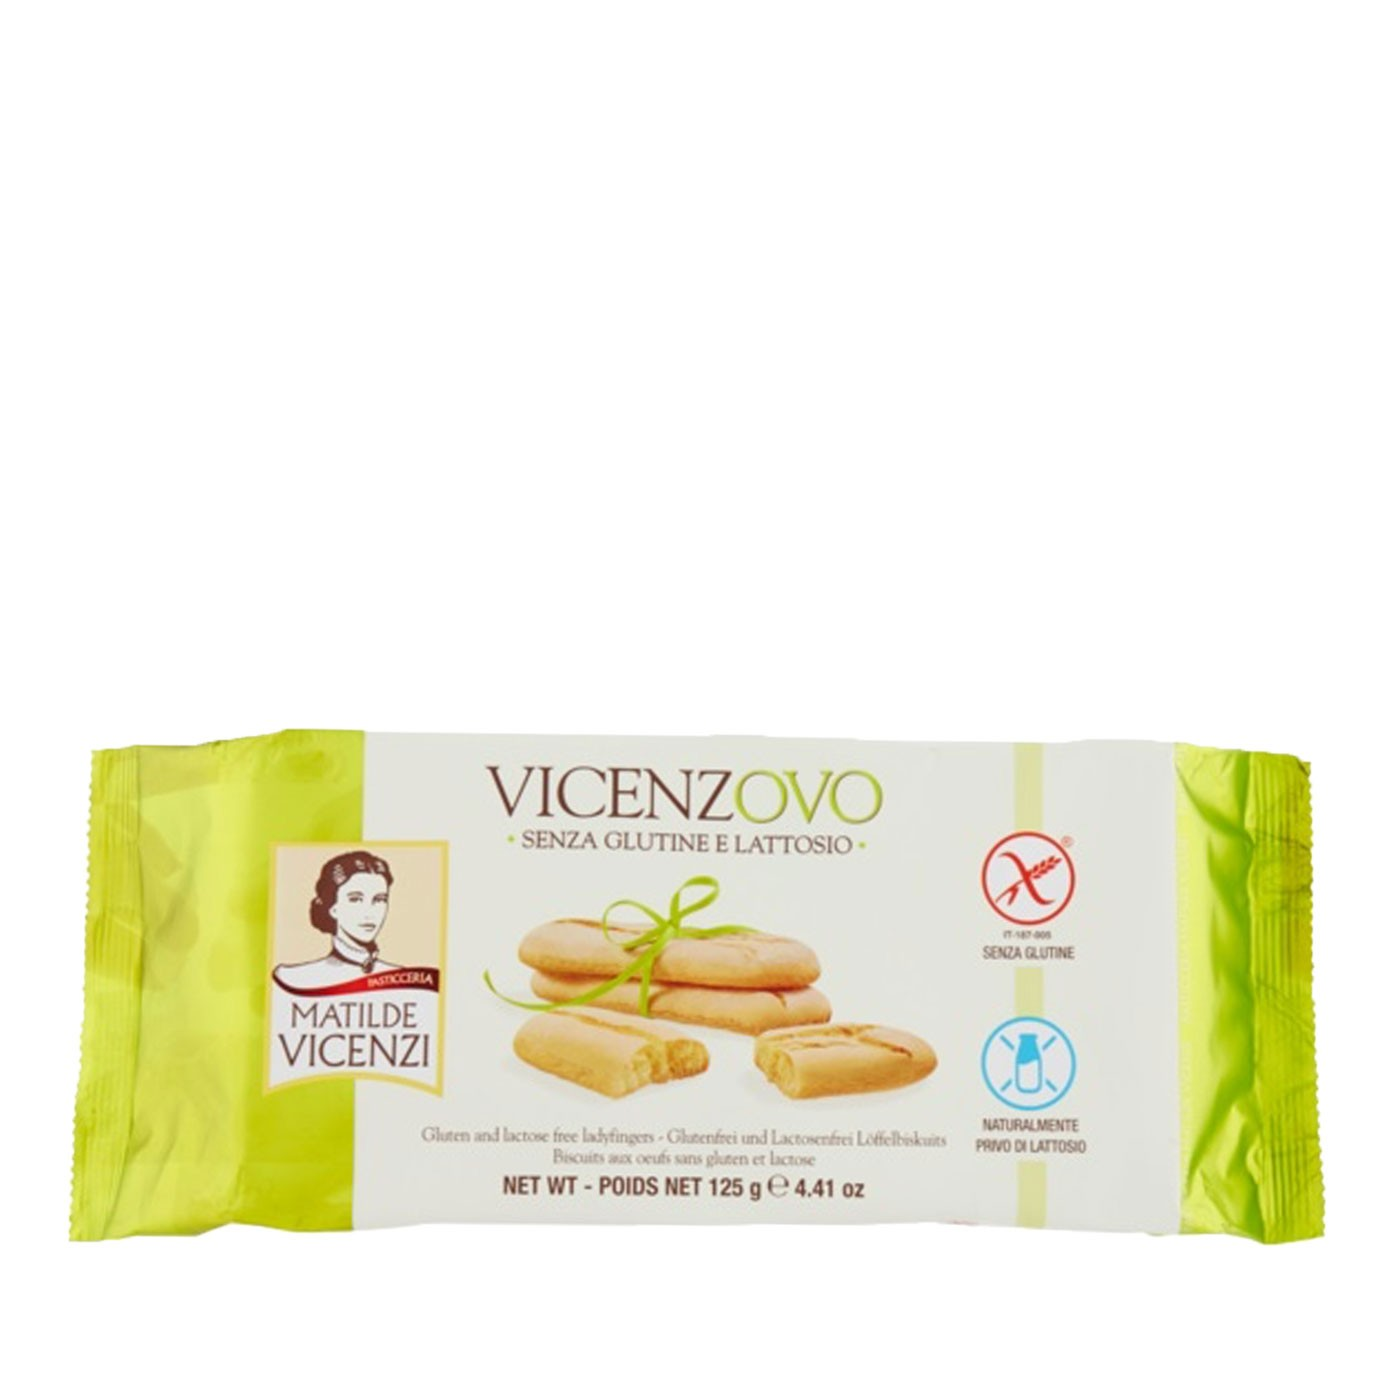 Vicenzovo Gluten-Free Ladyfingers 4.41 oz